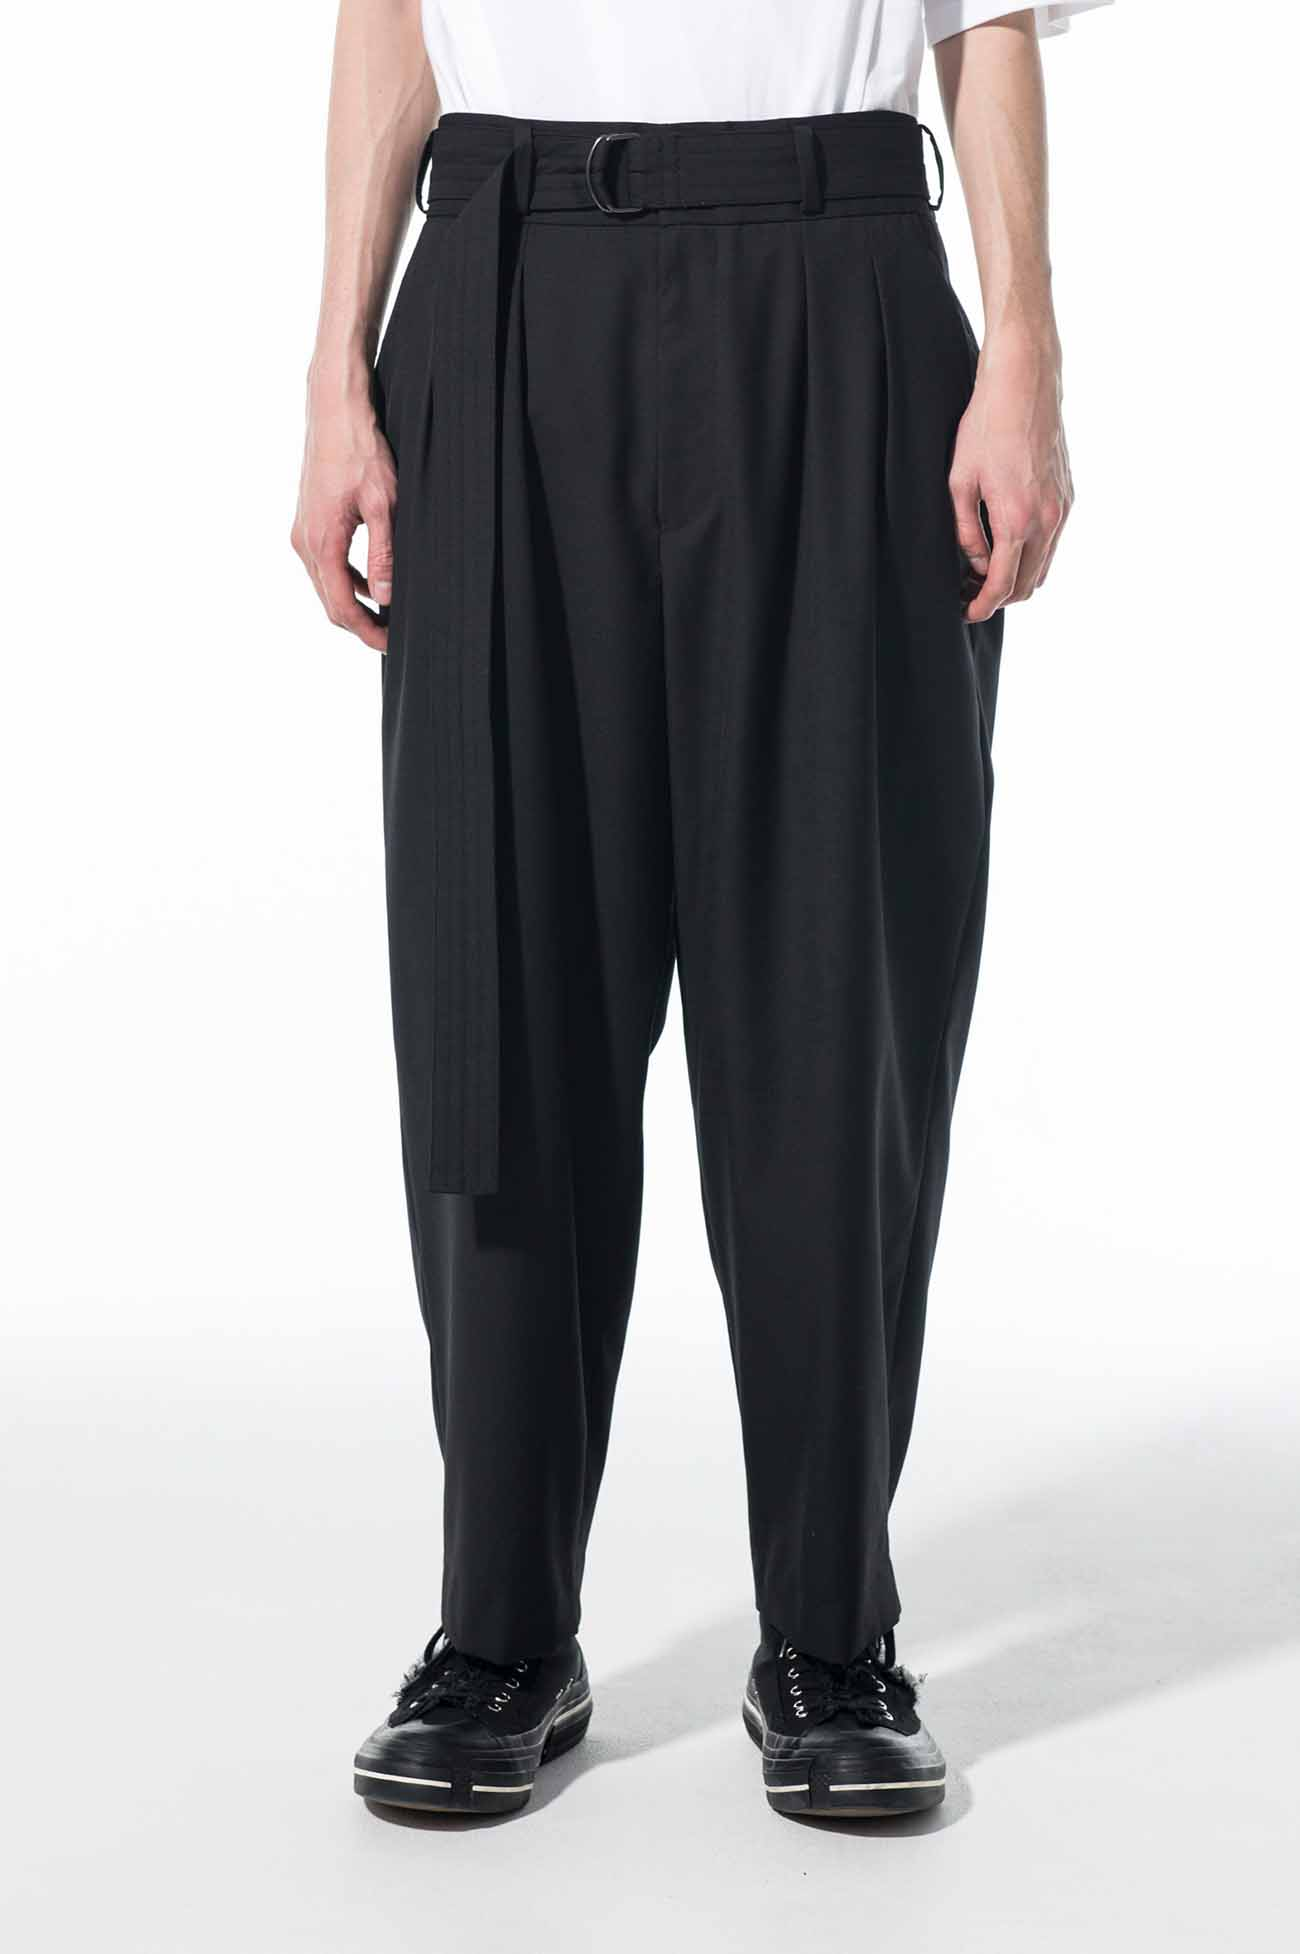 T/W Gabardine Washable 2-Tuck Tapered Belt Pants